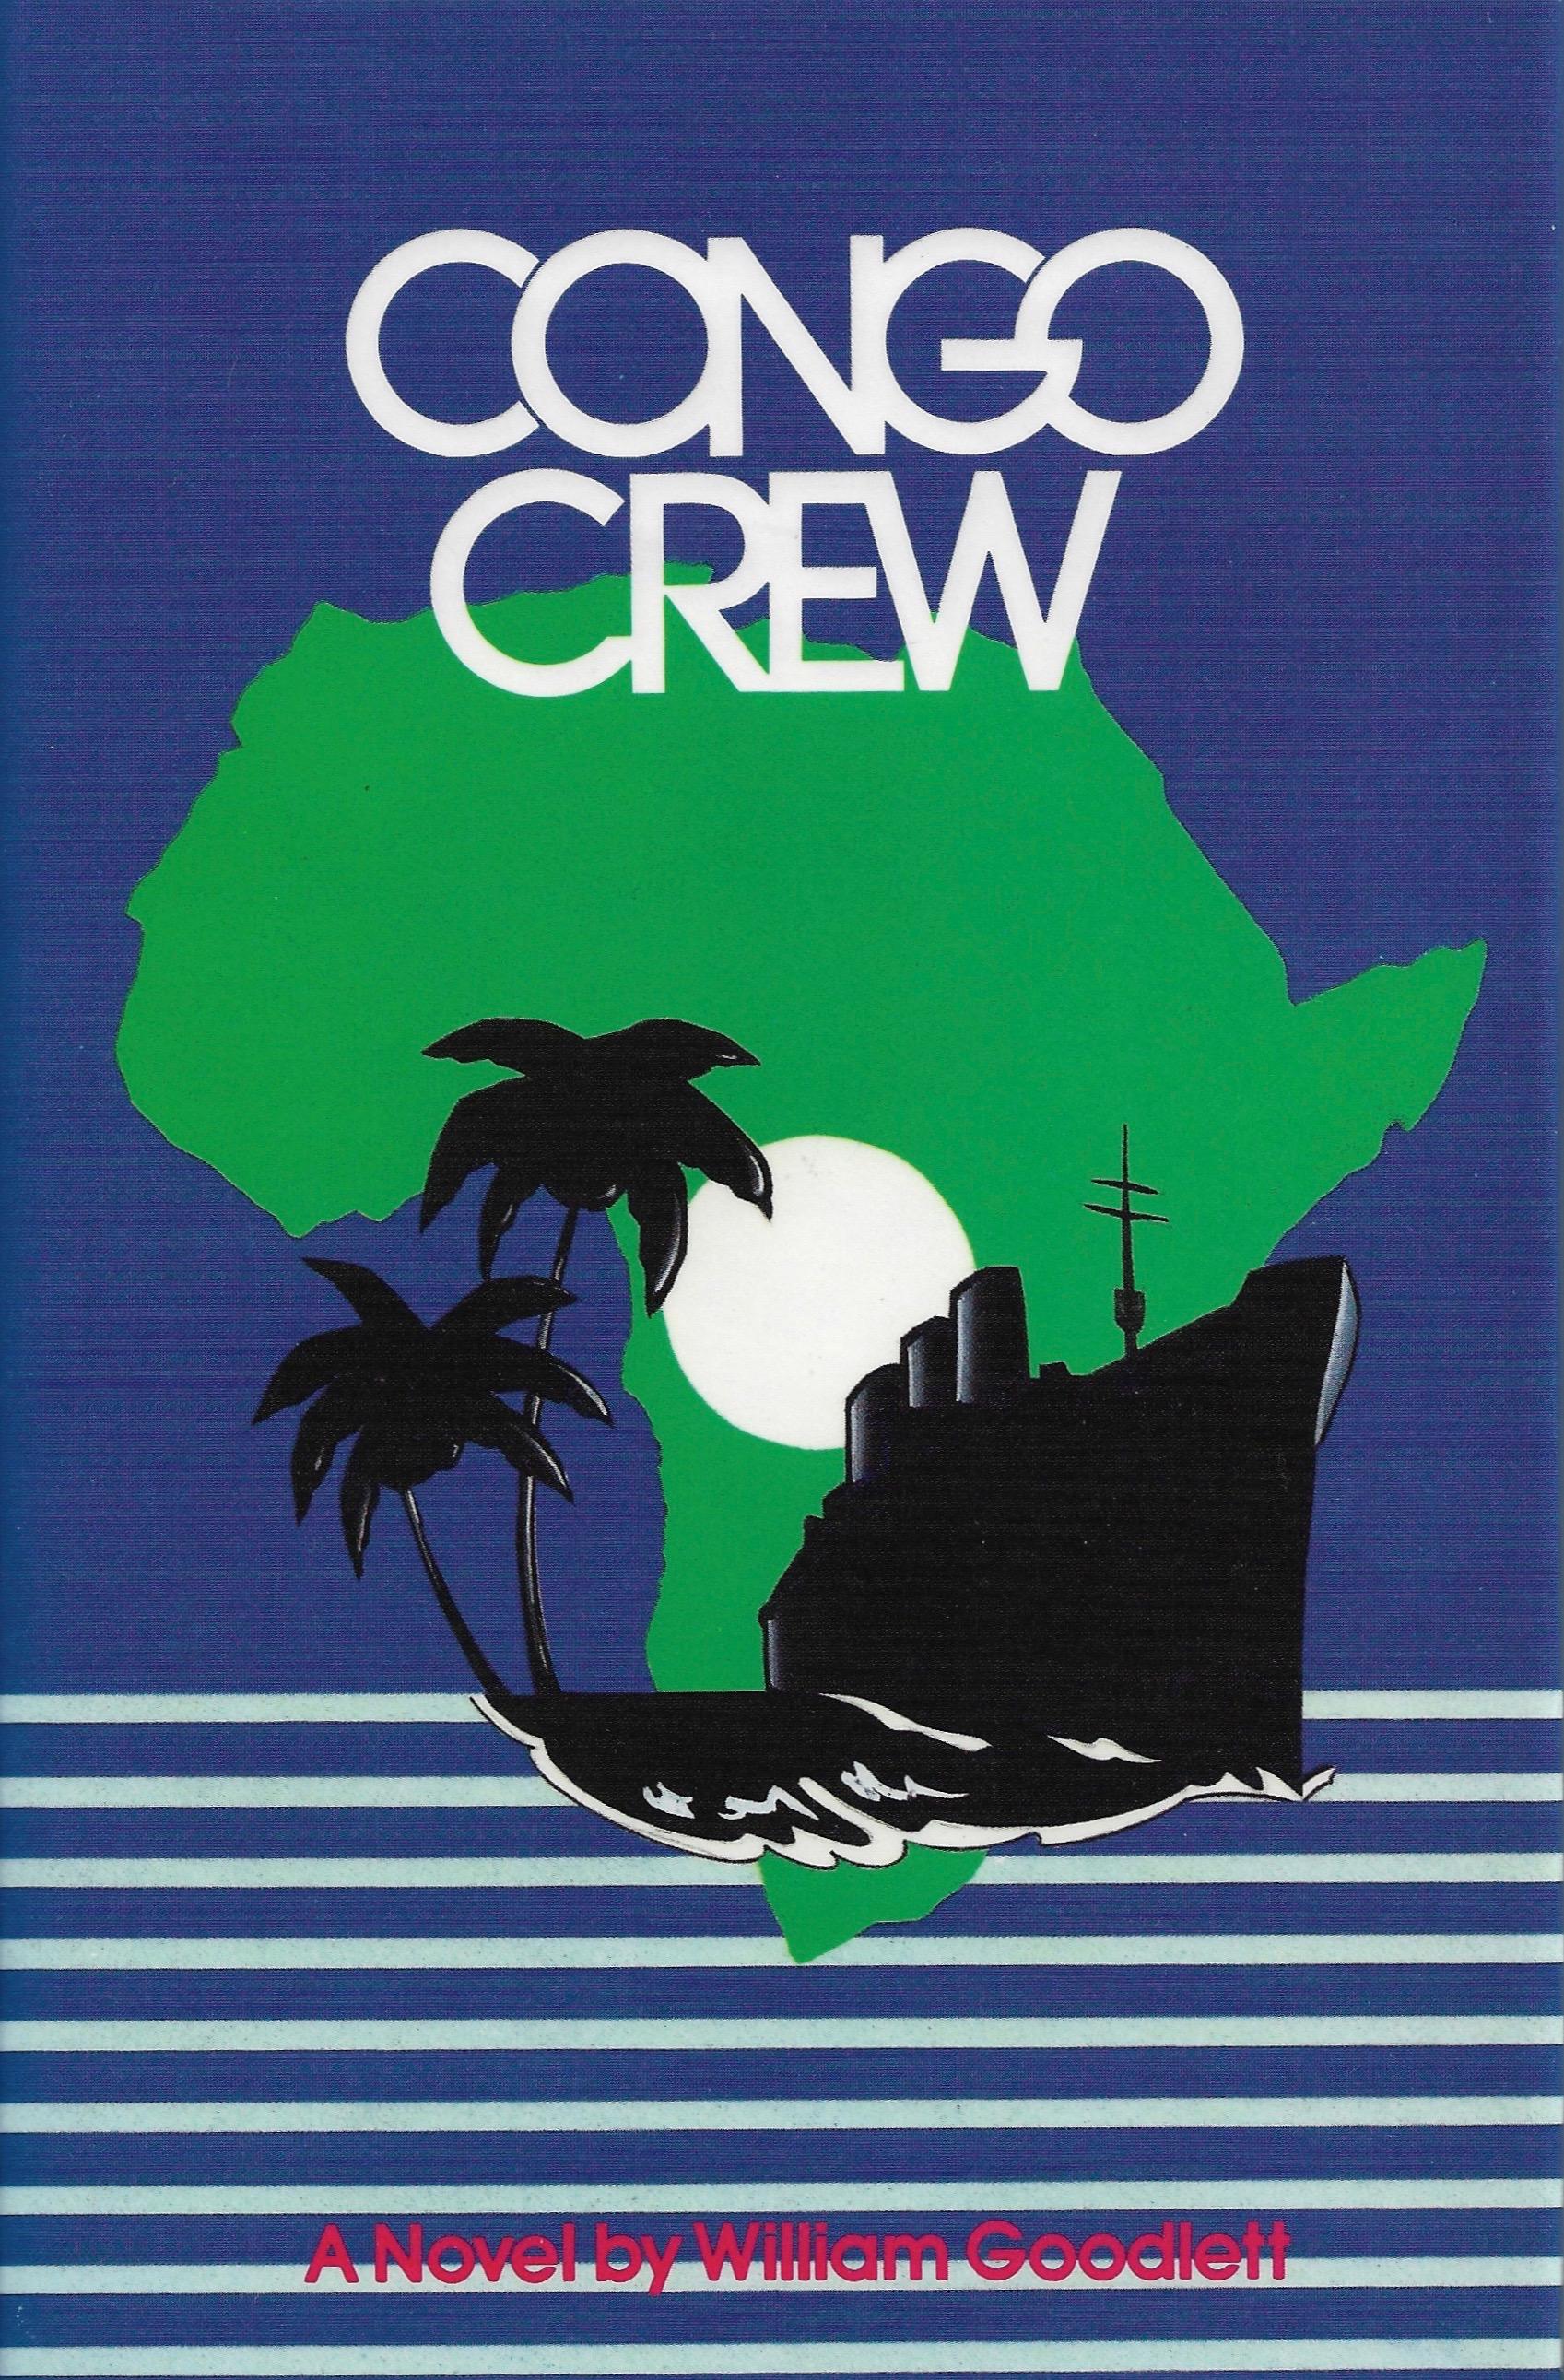 Congo Crew.jpeg